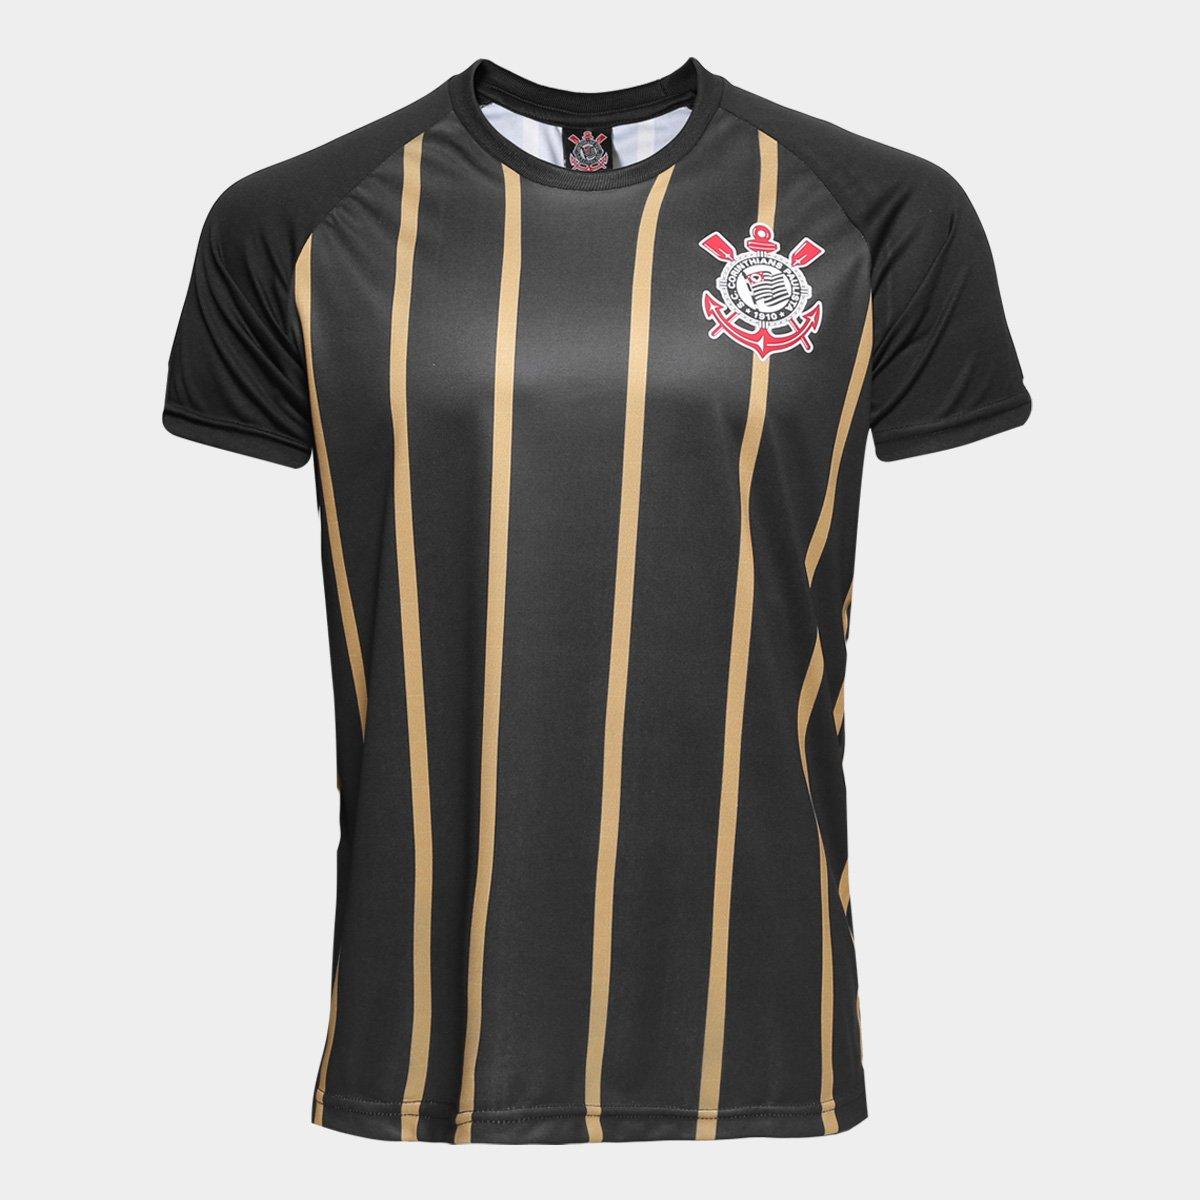 d16411eb9a Camisa Corinthians Gold nº10 - Edição Limitada Masculina